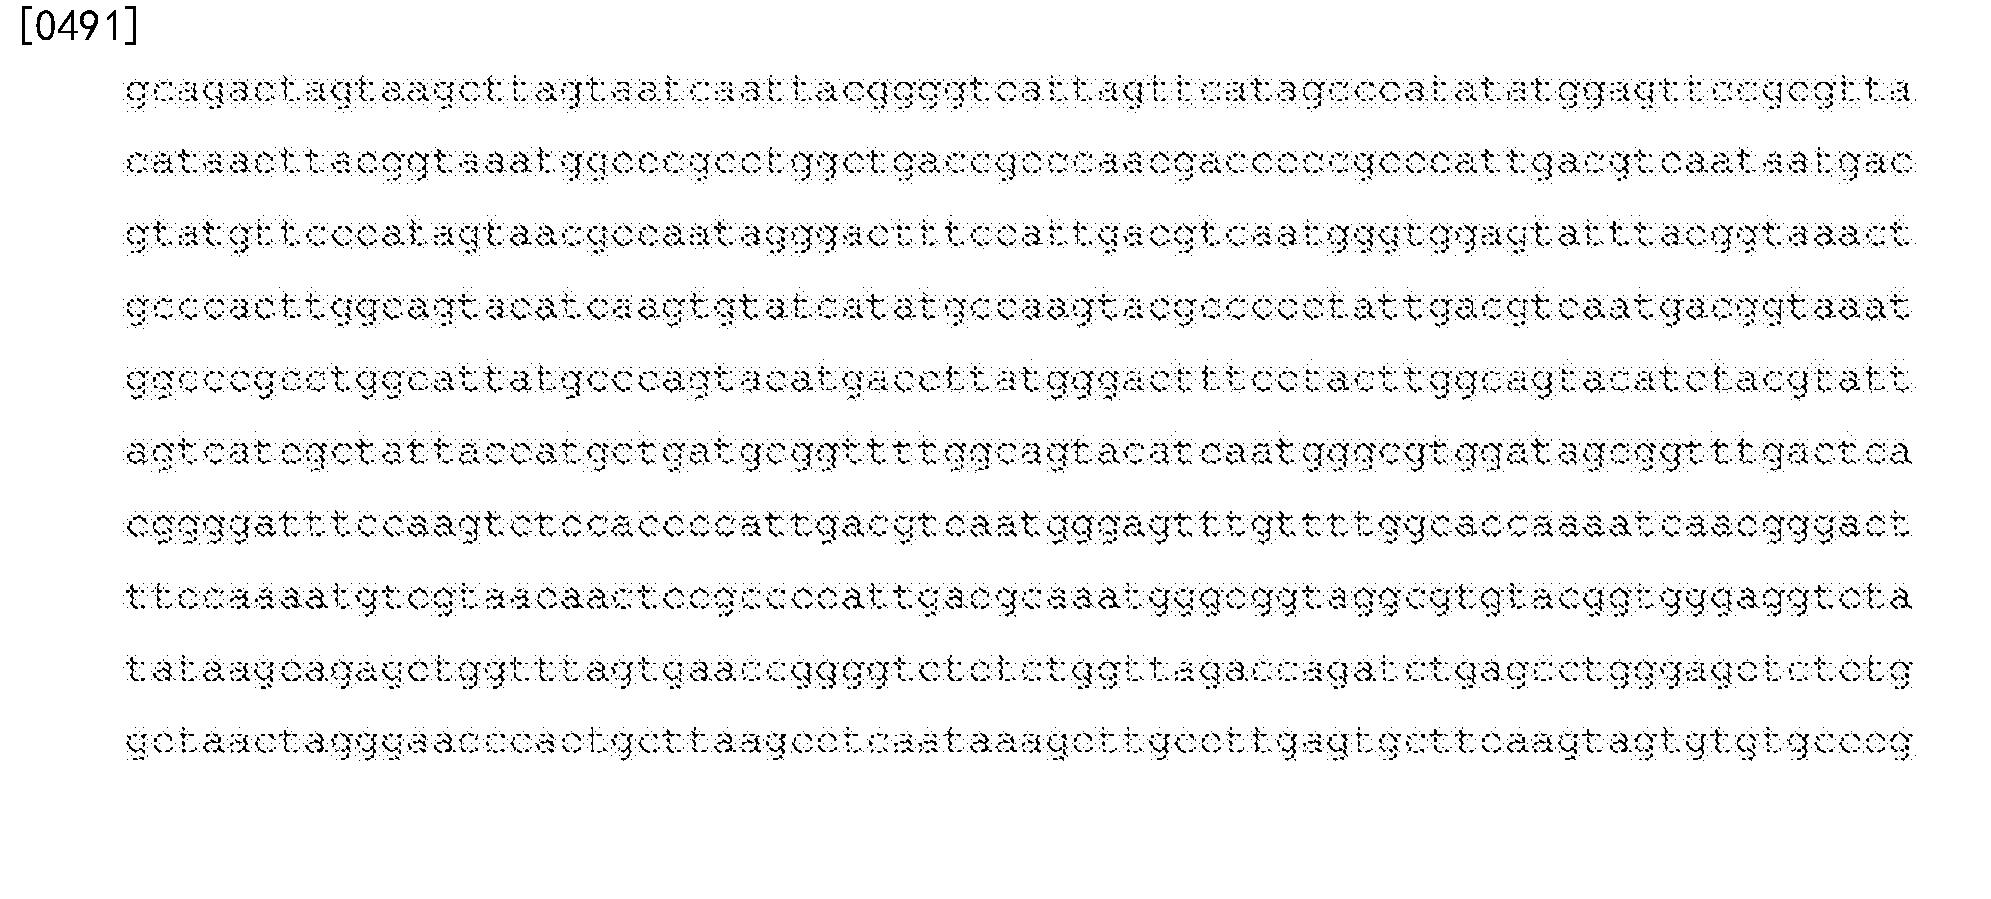 Figure CN108603200AD00721